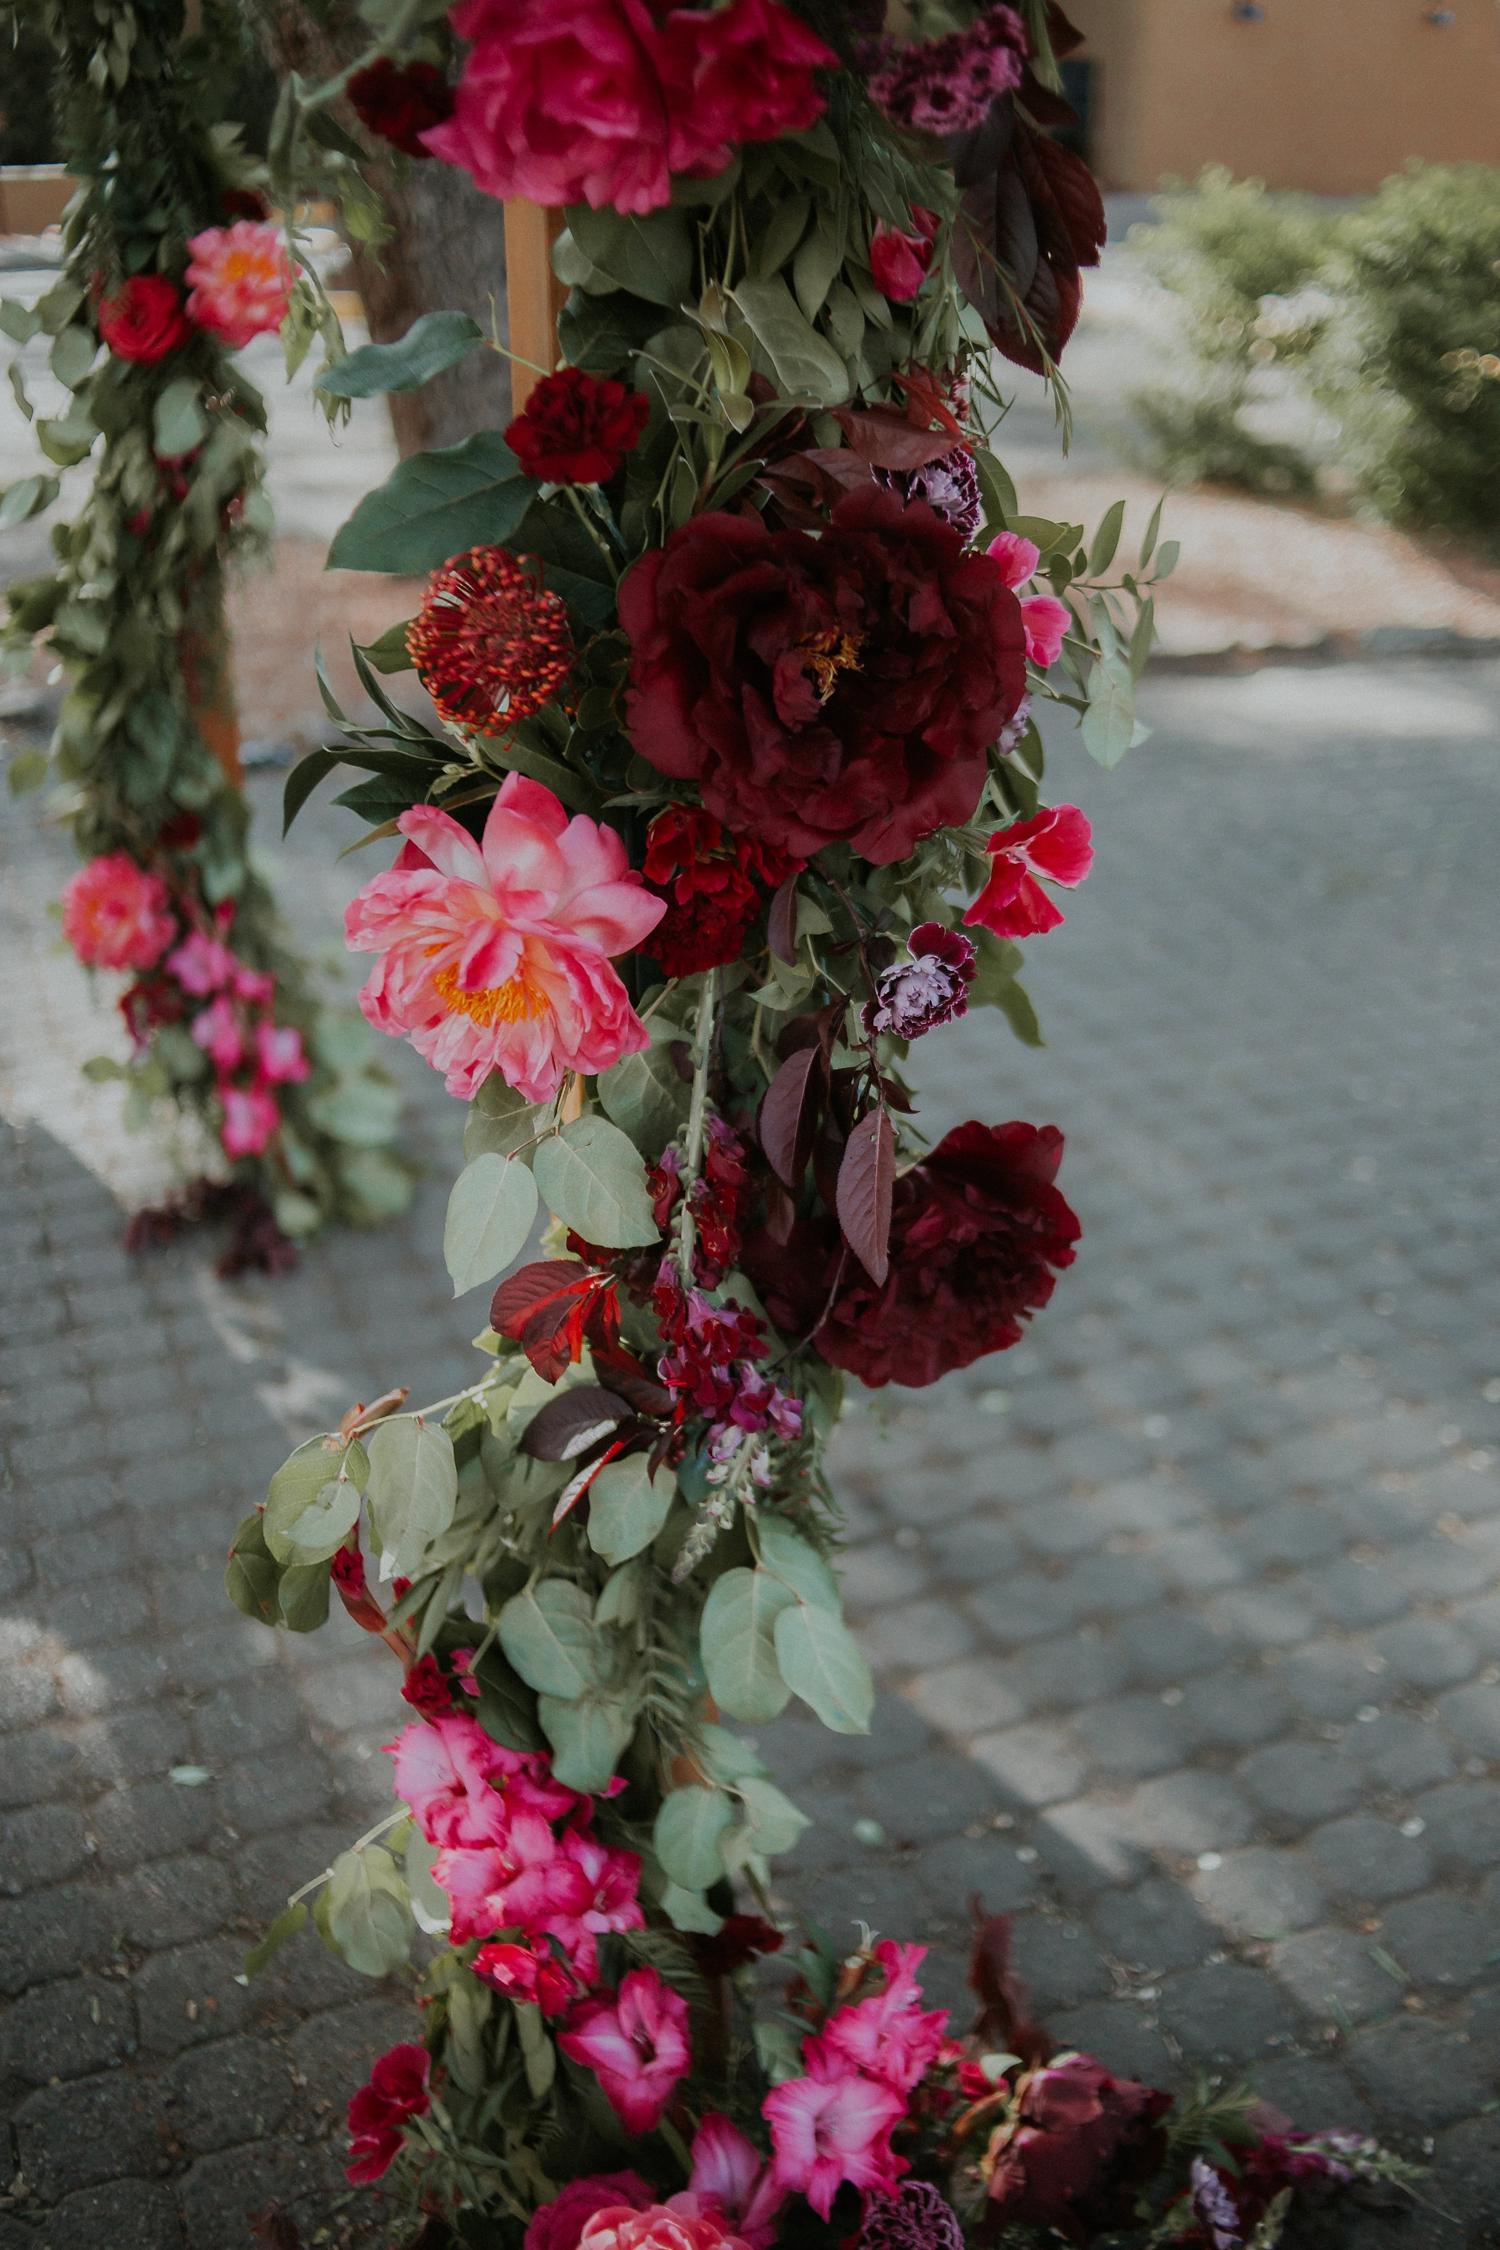 Alicia+lucia+photography+-+albuquerque+wedding+photographer+-+santa+fe+wedding+photography+-+new+mexico+wedding+photographer+-+wedding+flowers+-+summer+wedding+flowers_0006.jpg